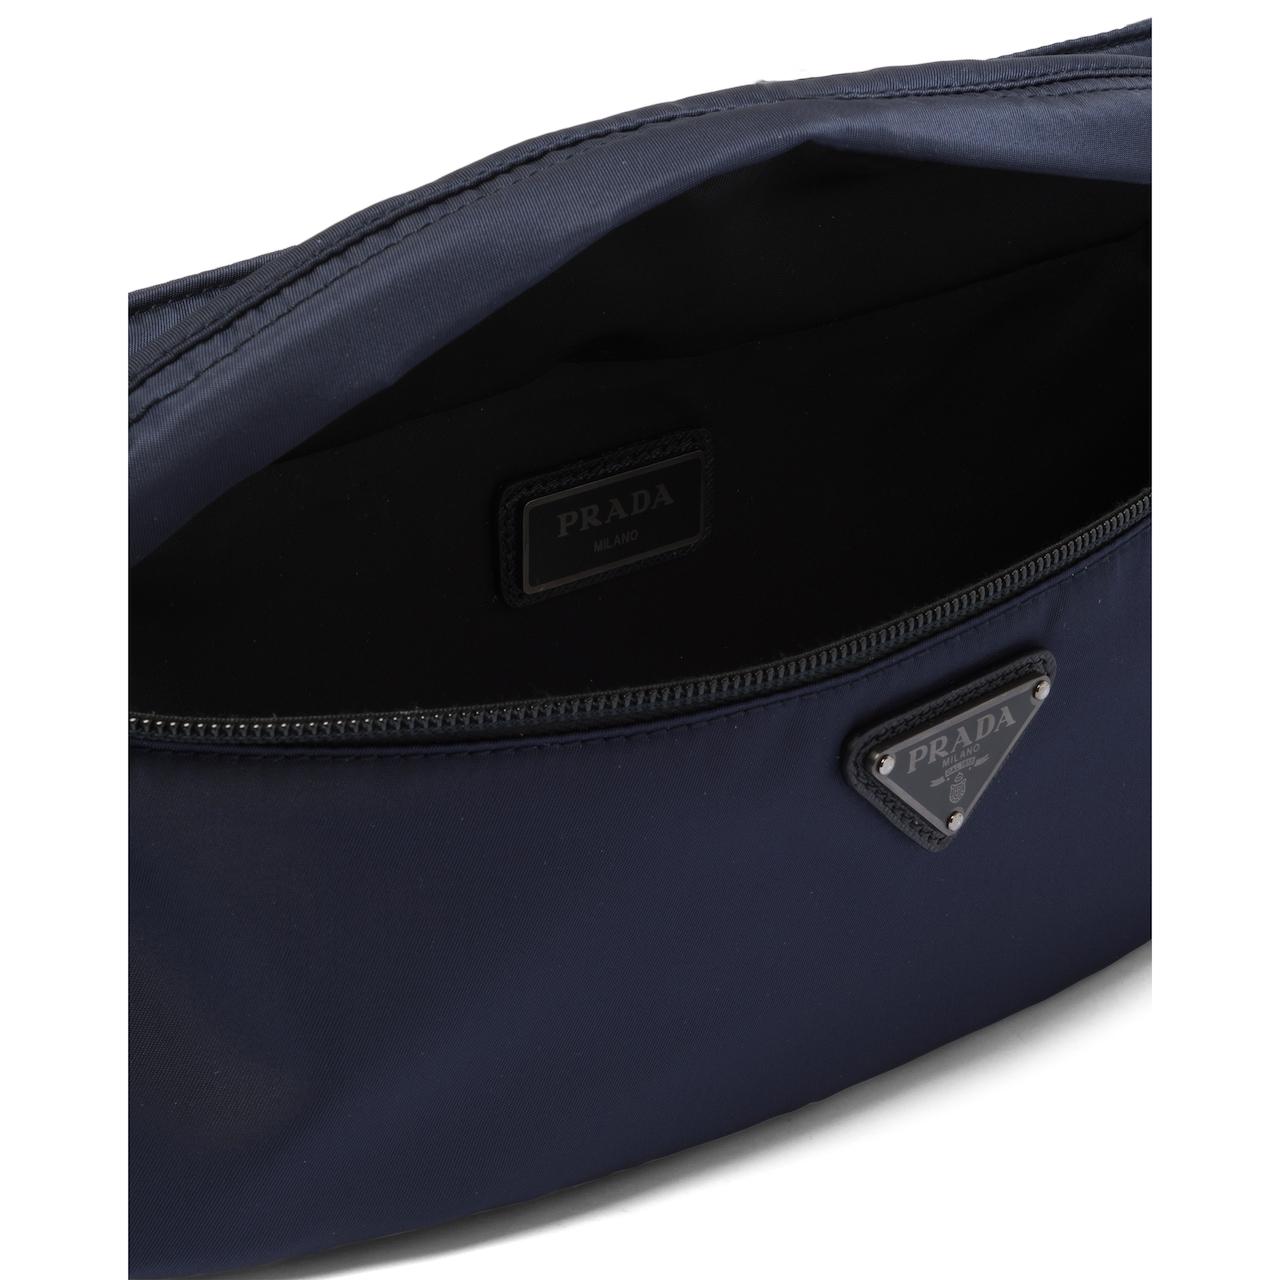 Prada Prada Re-Nylon belt bag 5